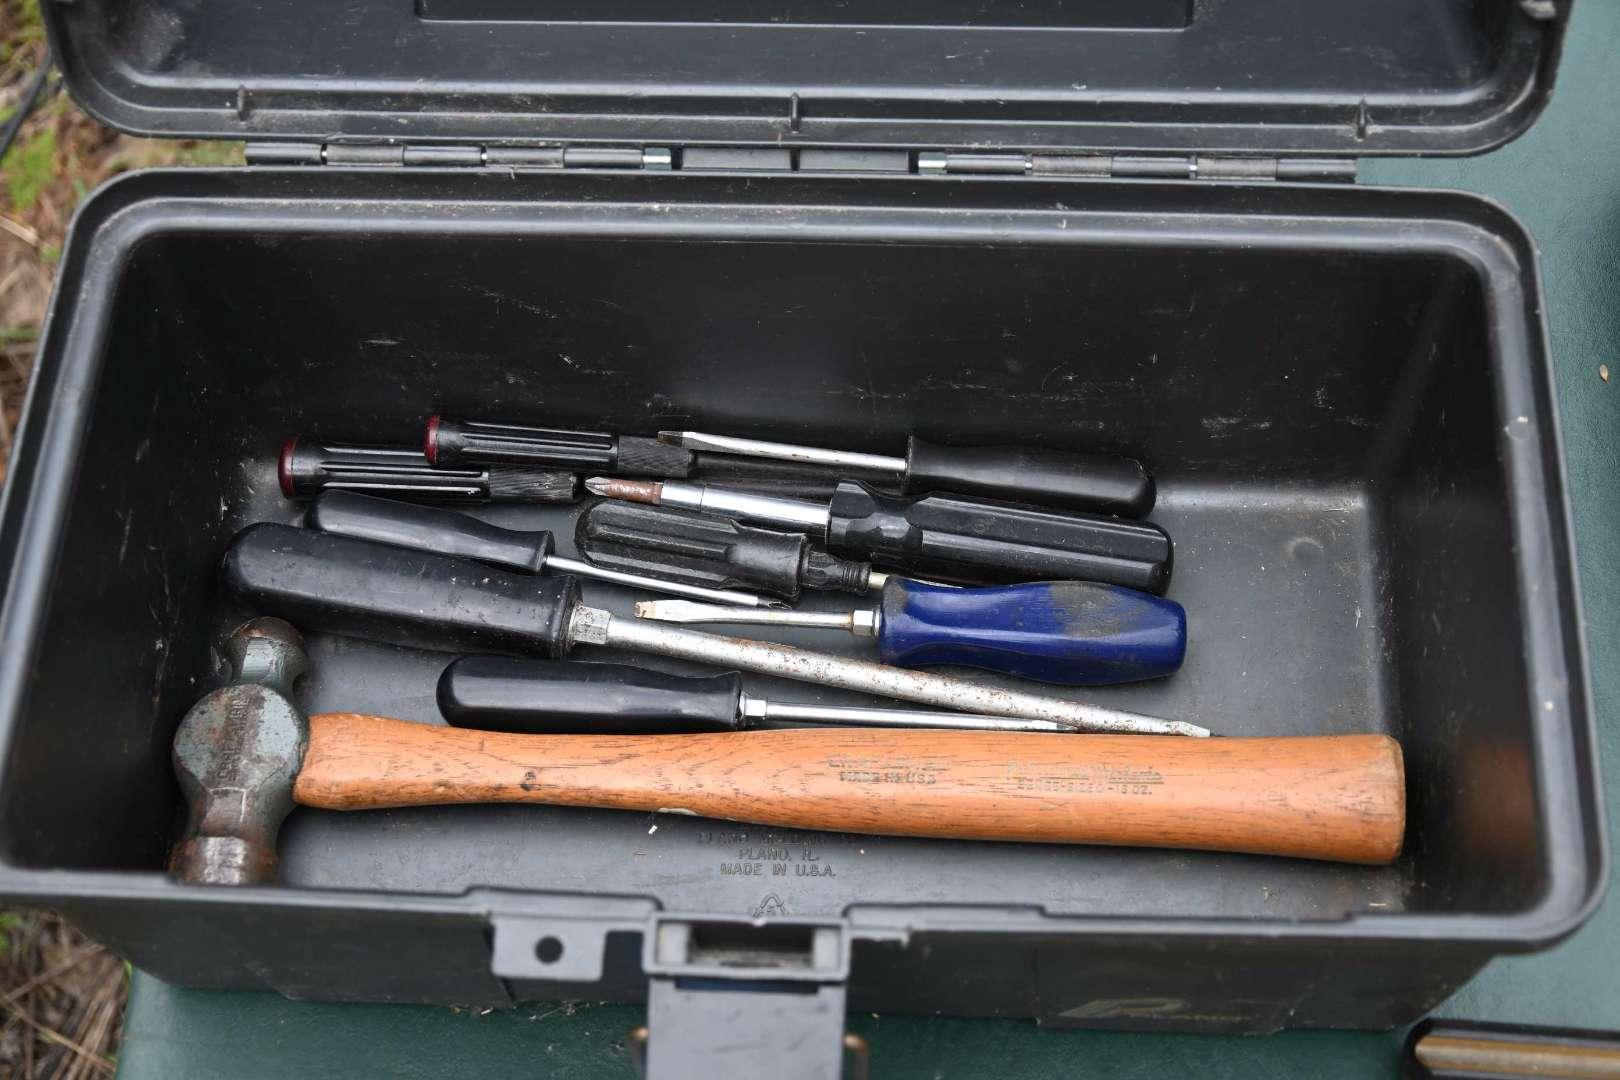 Lot # 146 Toolbox and tools